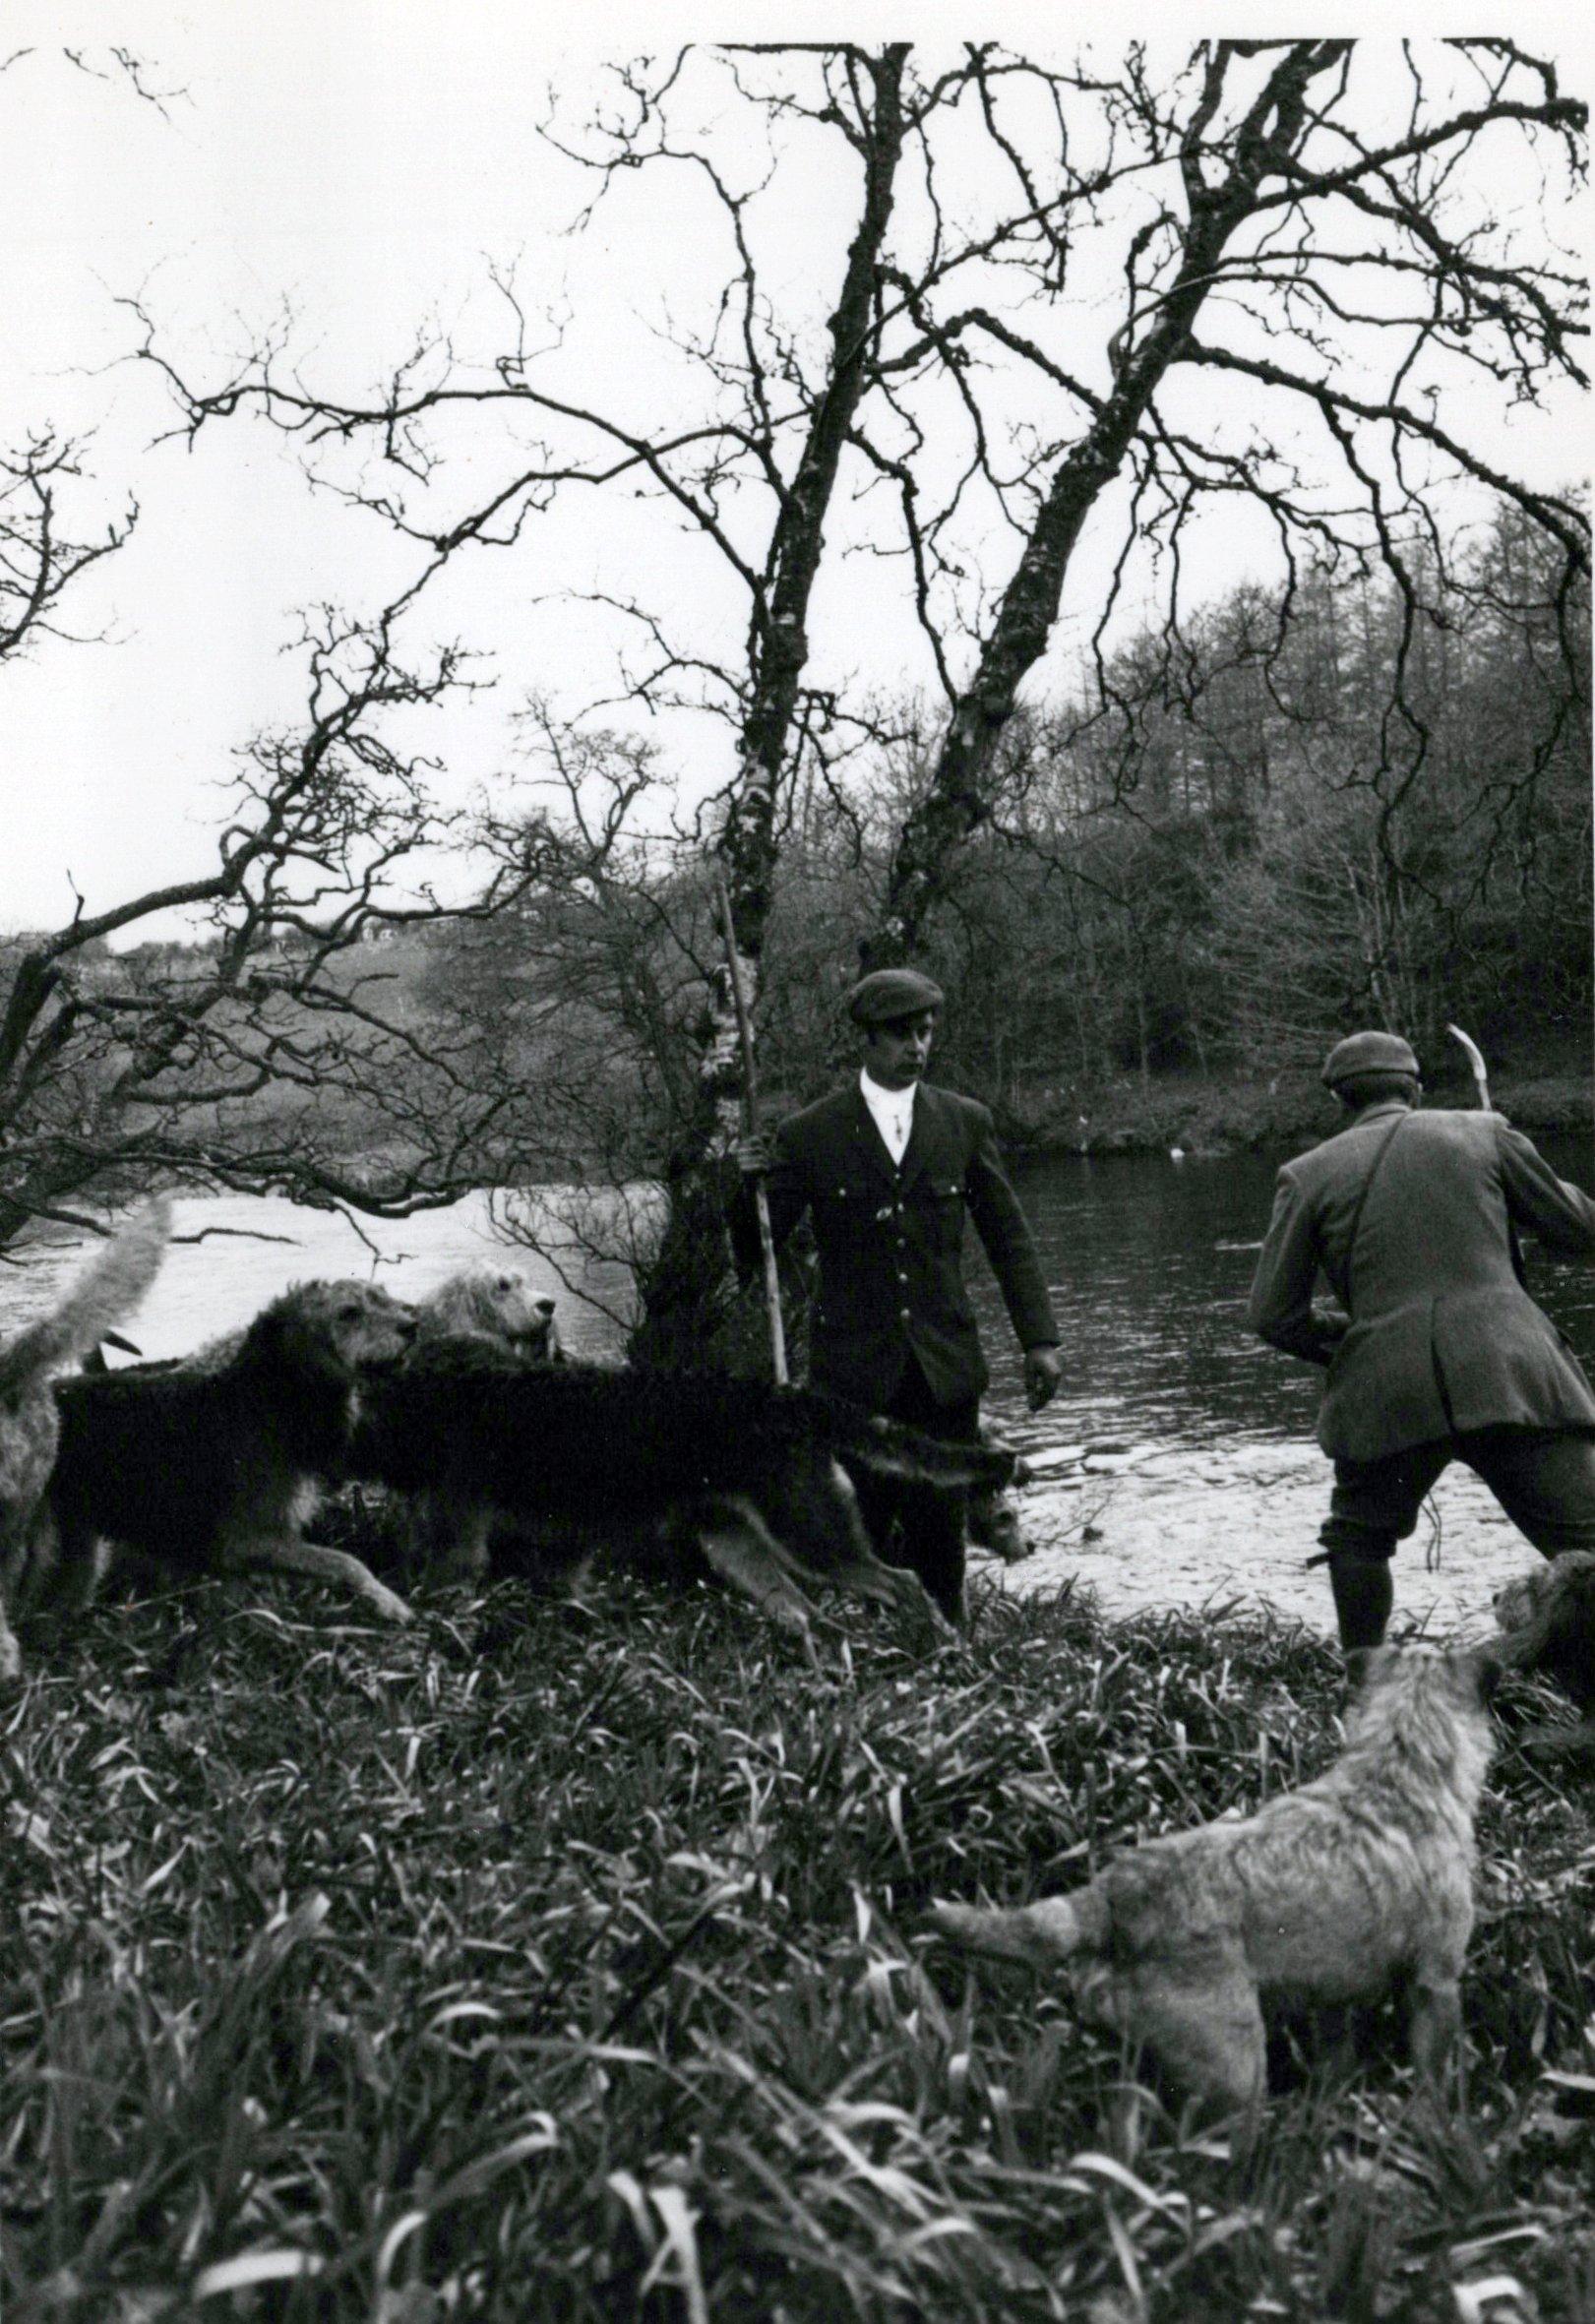 1970_Mei_Otterhound-Schotland_0008_a